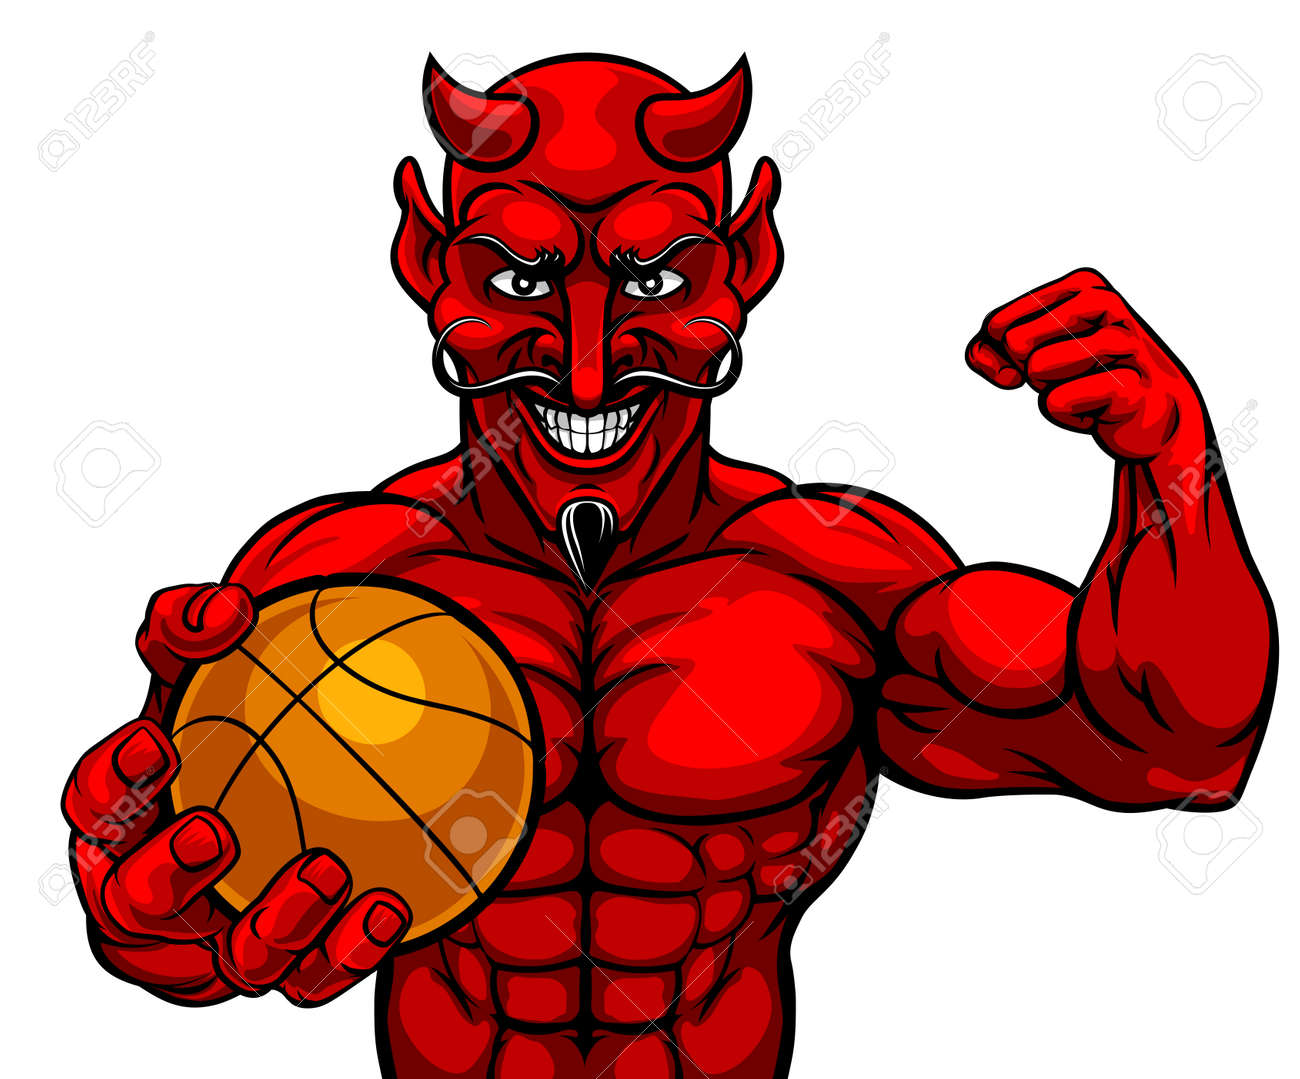 Devil Basketball Sports Mascot Holding Ball - 122241261